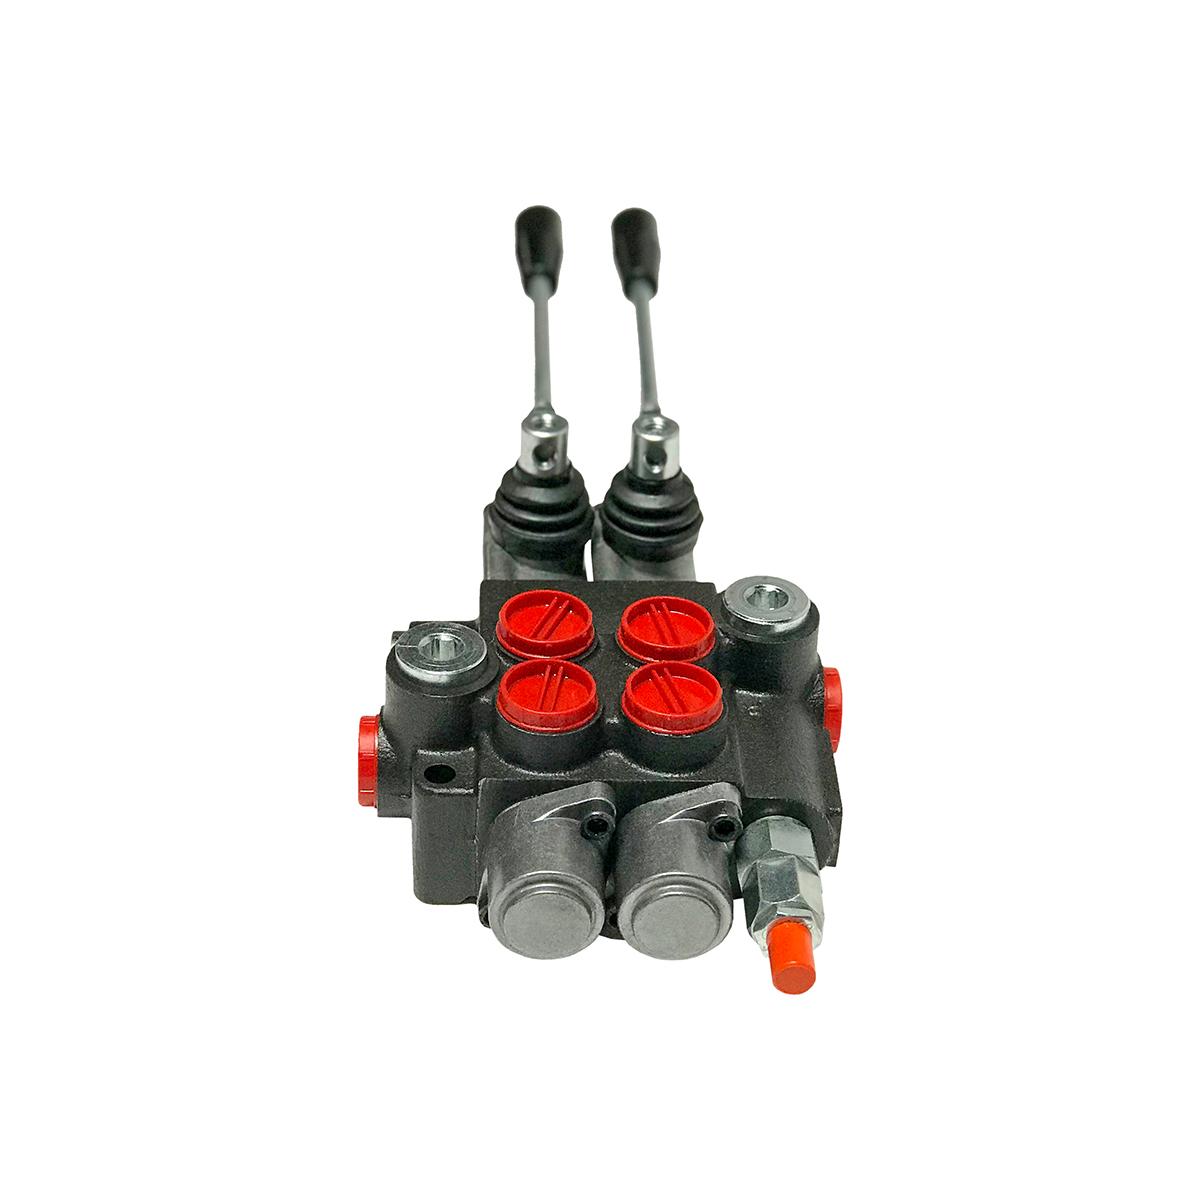 2 spool x 11 GPM hydraulic control valve, monoblock cast iron valve | Magister Hydraulics